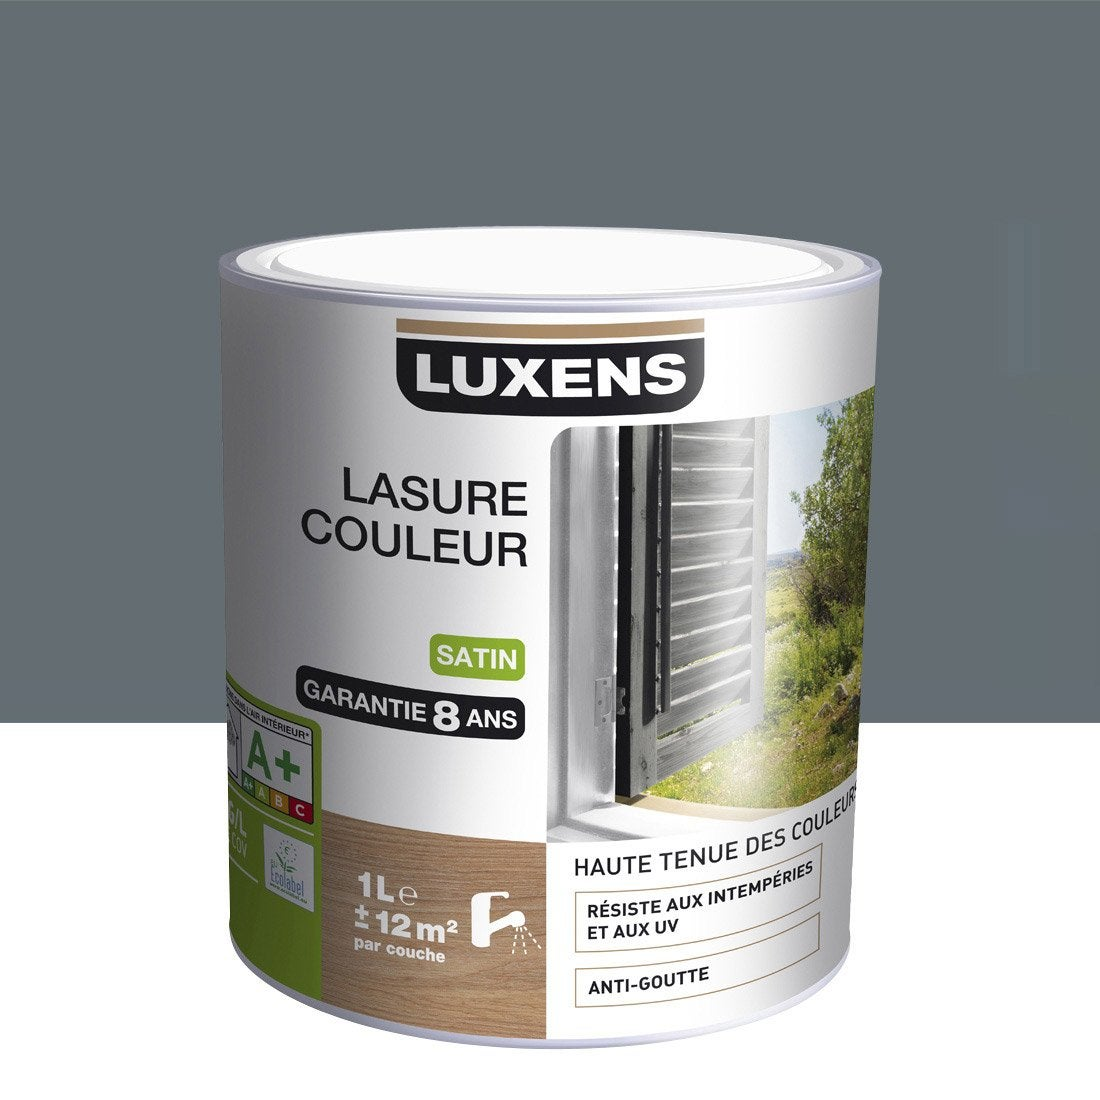 lasure luxens gris galet n 1 aspect satin 1 l leroy merlin. Black Bedroom Furniture Sets. Home Design Ideas